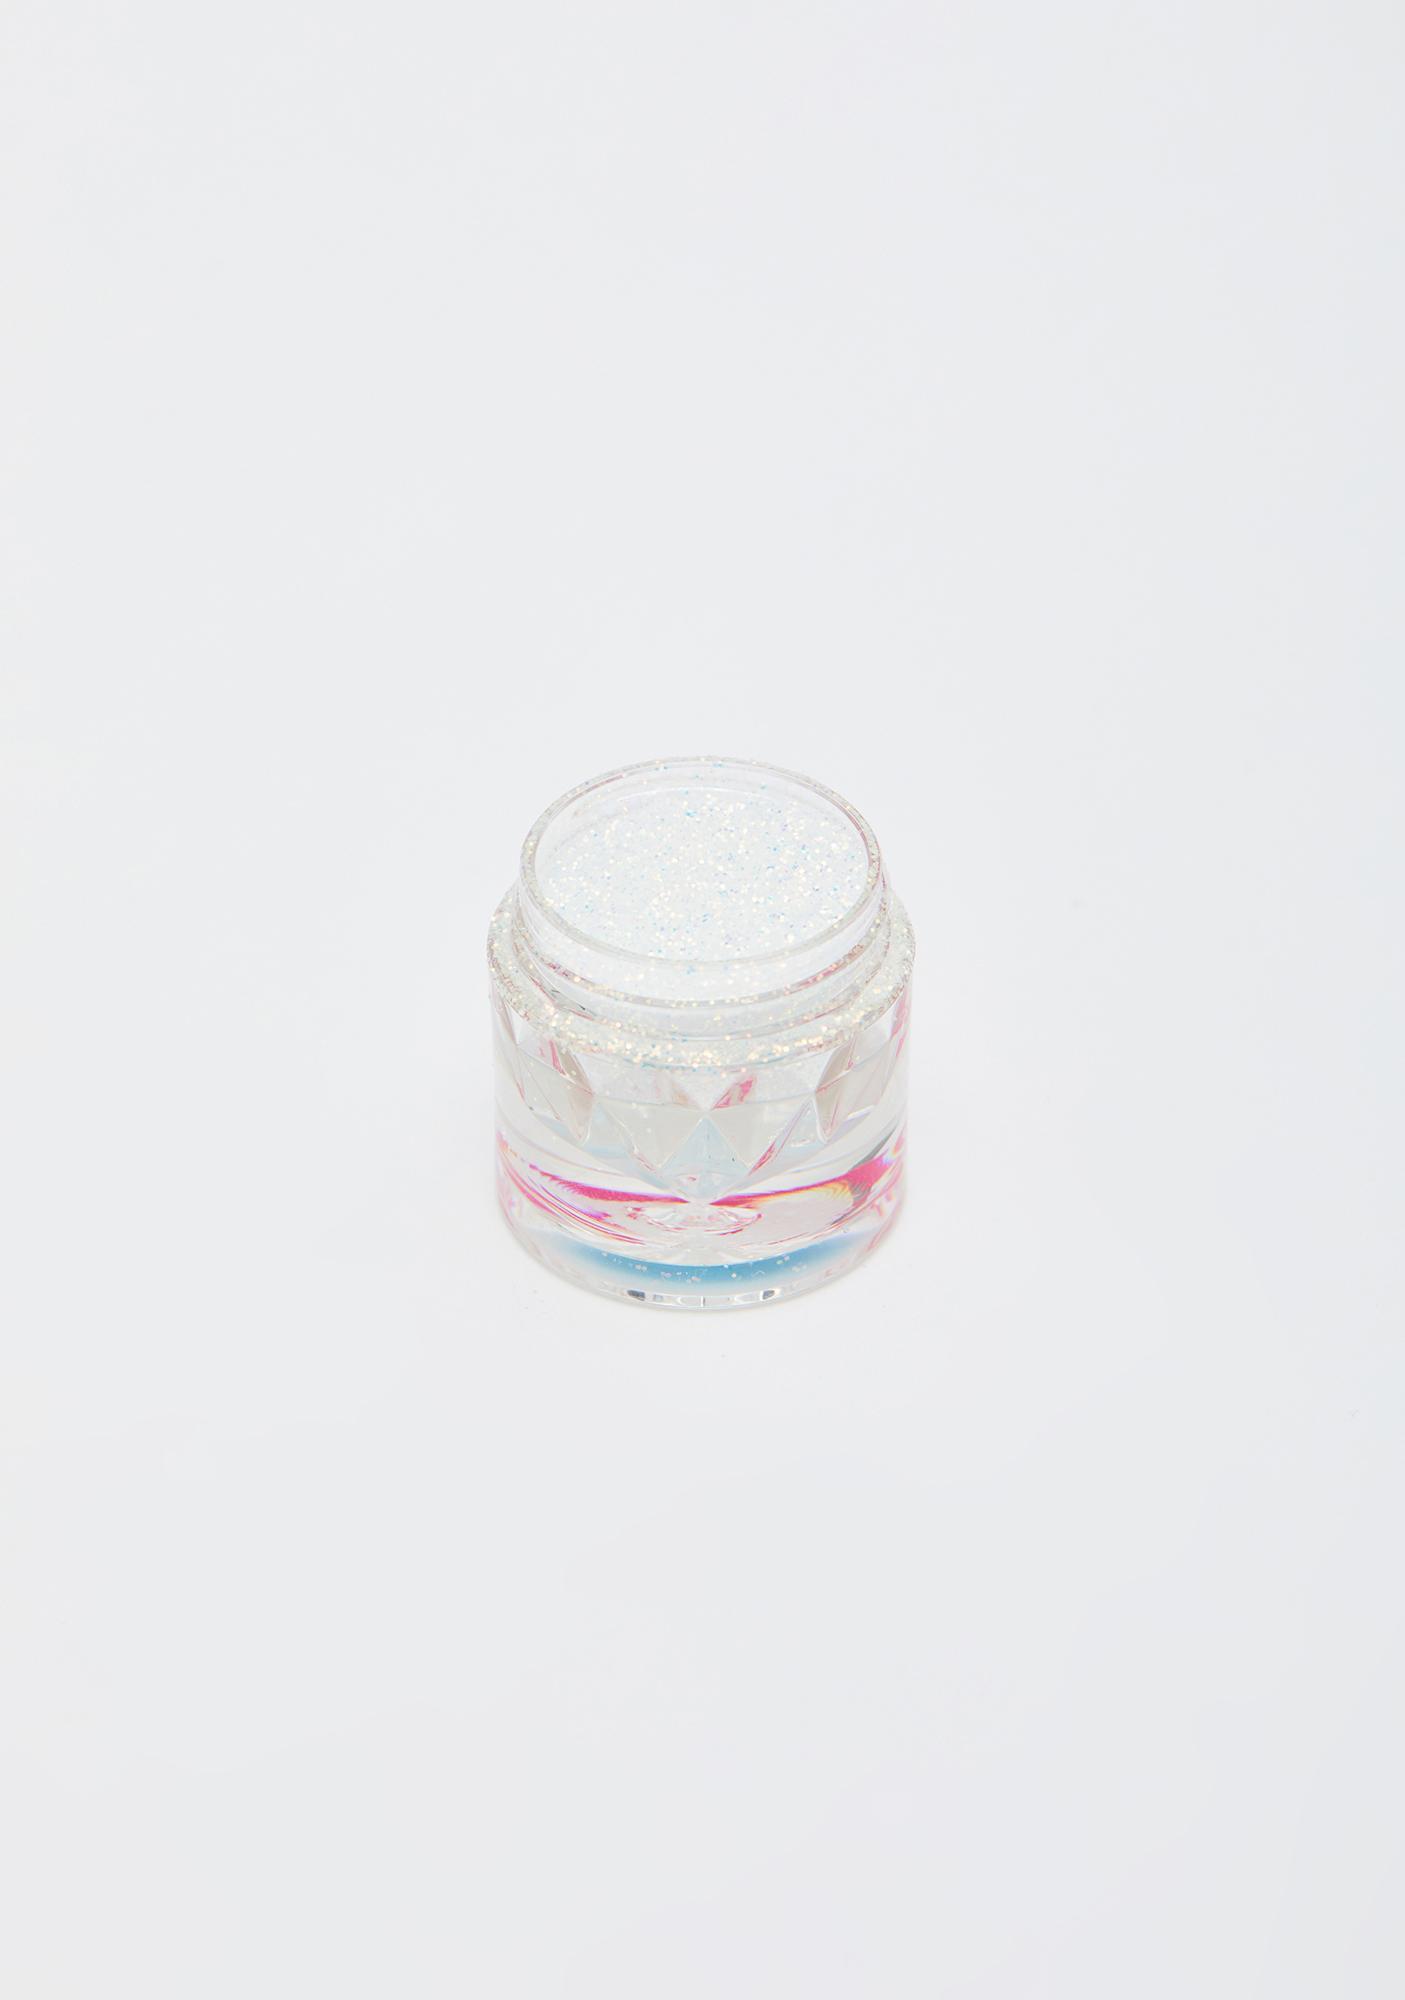 Trixie Cosmetics Marshmallow Sparkles Loose Glitter